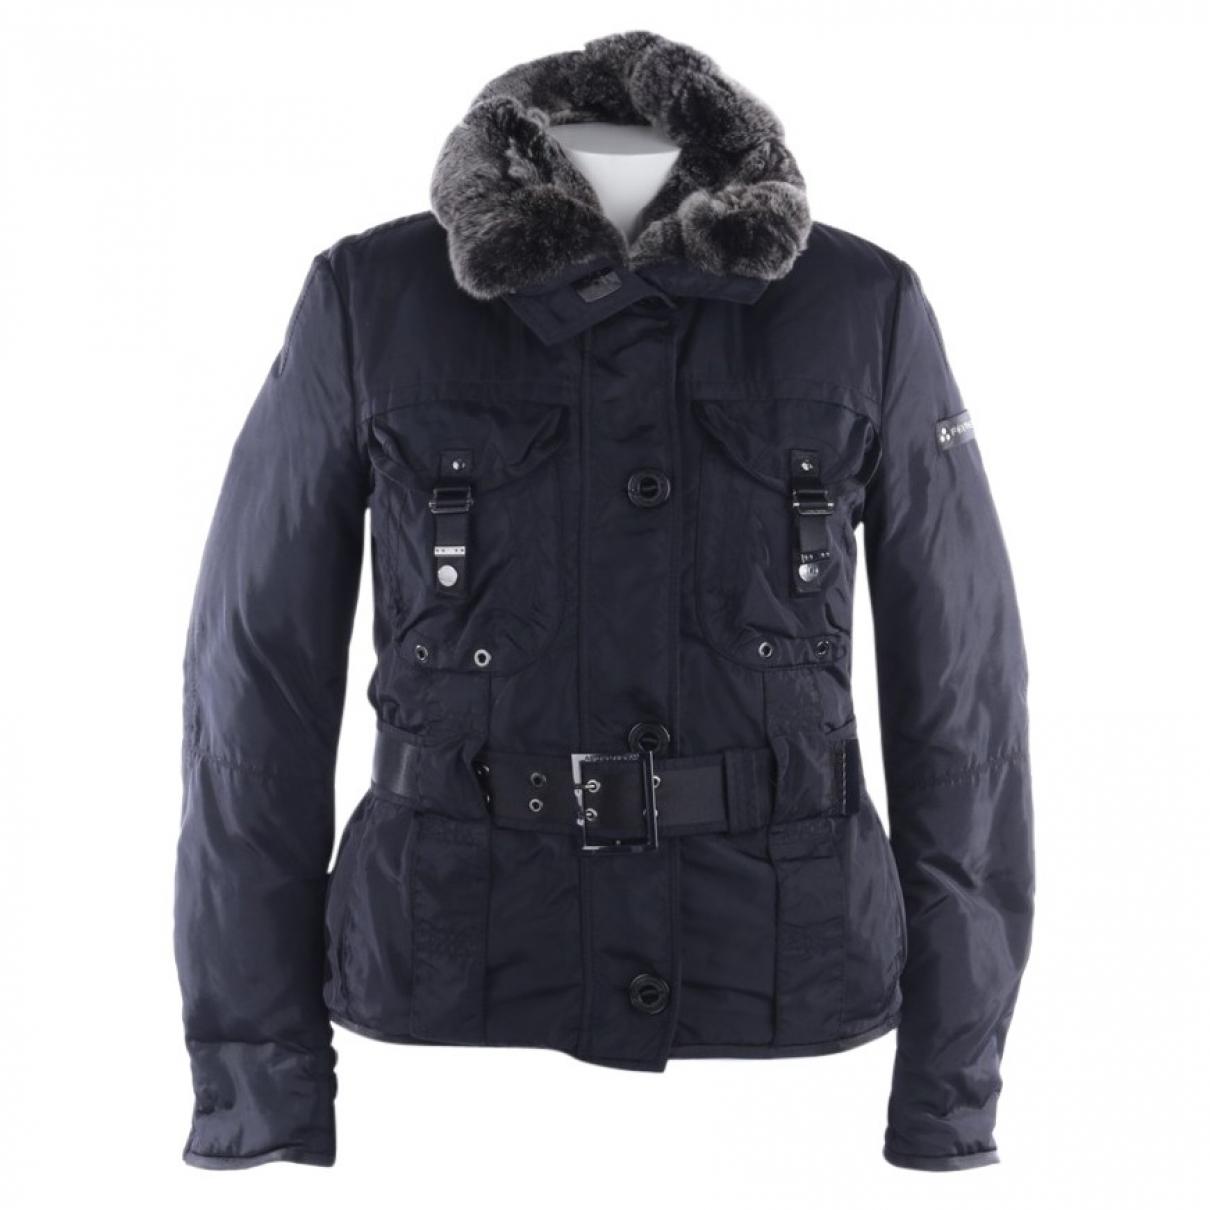 Peuterey \N Blue jacket for Women 40 FR